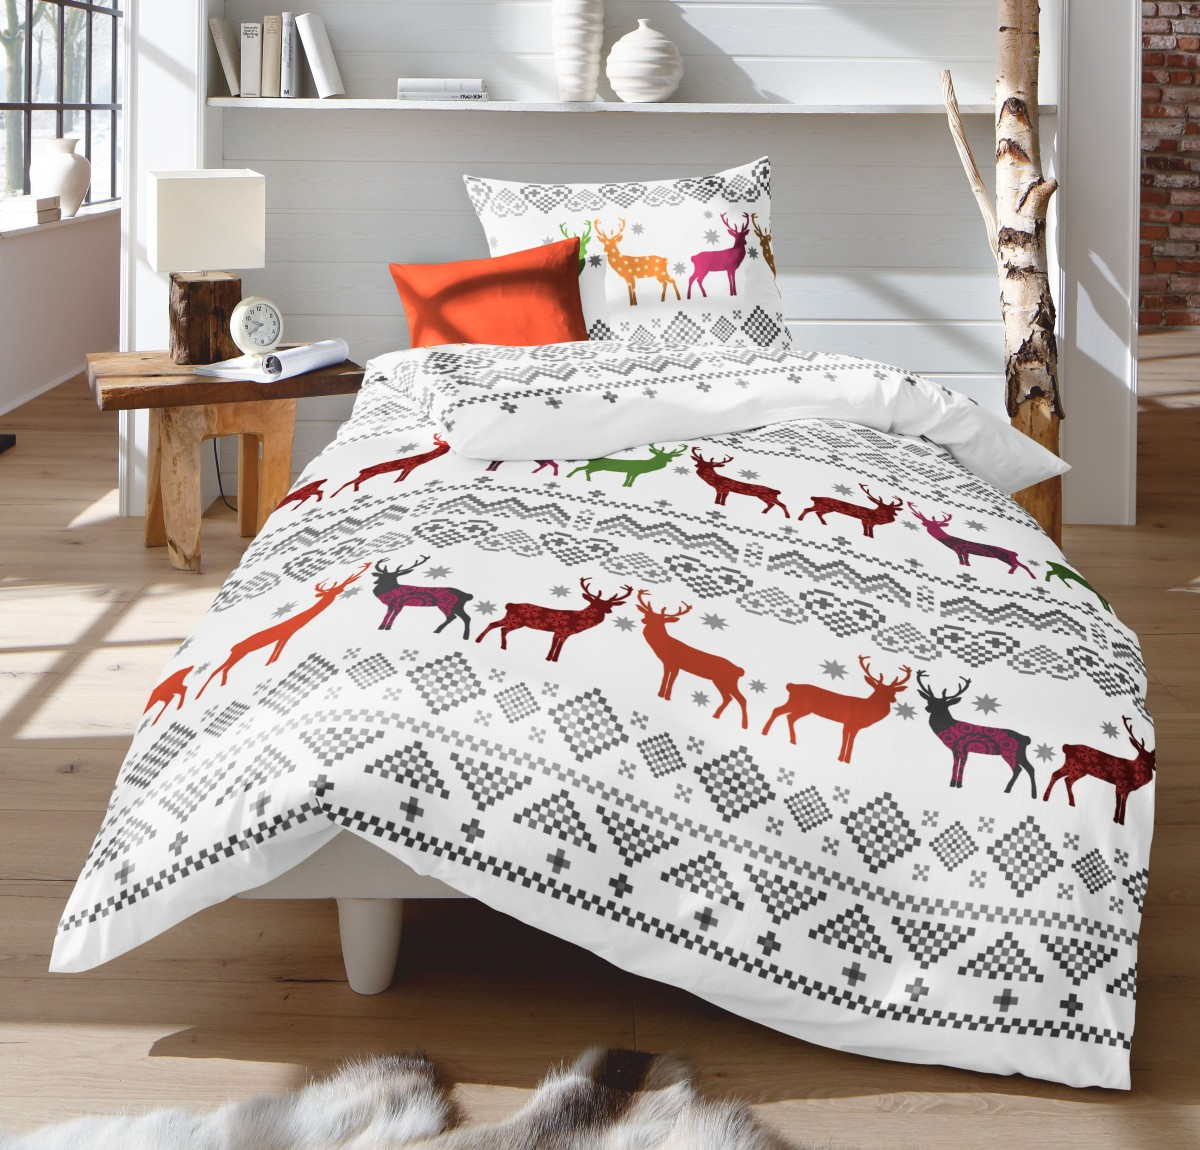 fleuresse fein biber bettw sche 2 tlg winter hirsche rot gr n wei silber grau. Black Bedroom Furniture Sets. Home Design Ideas